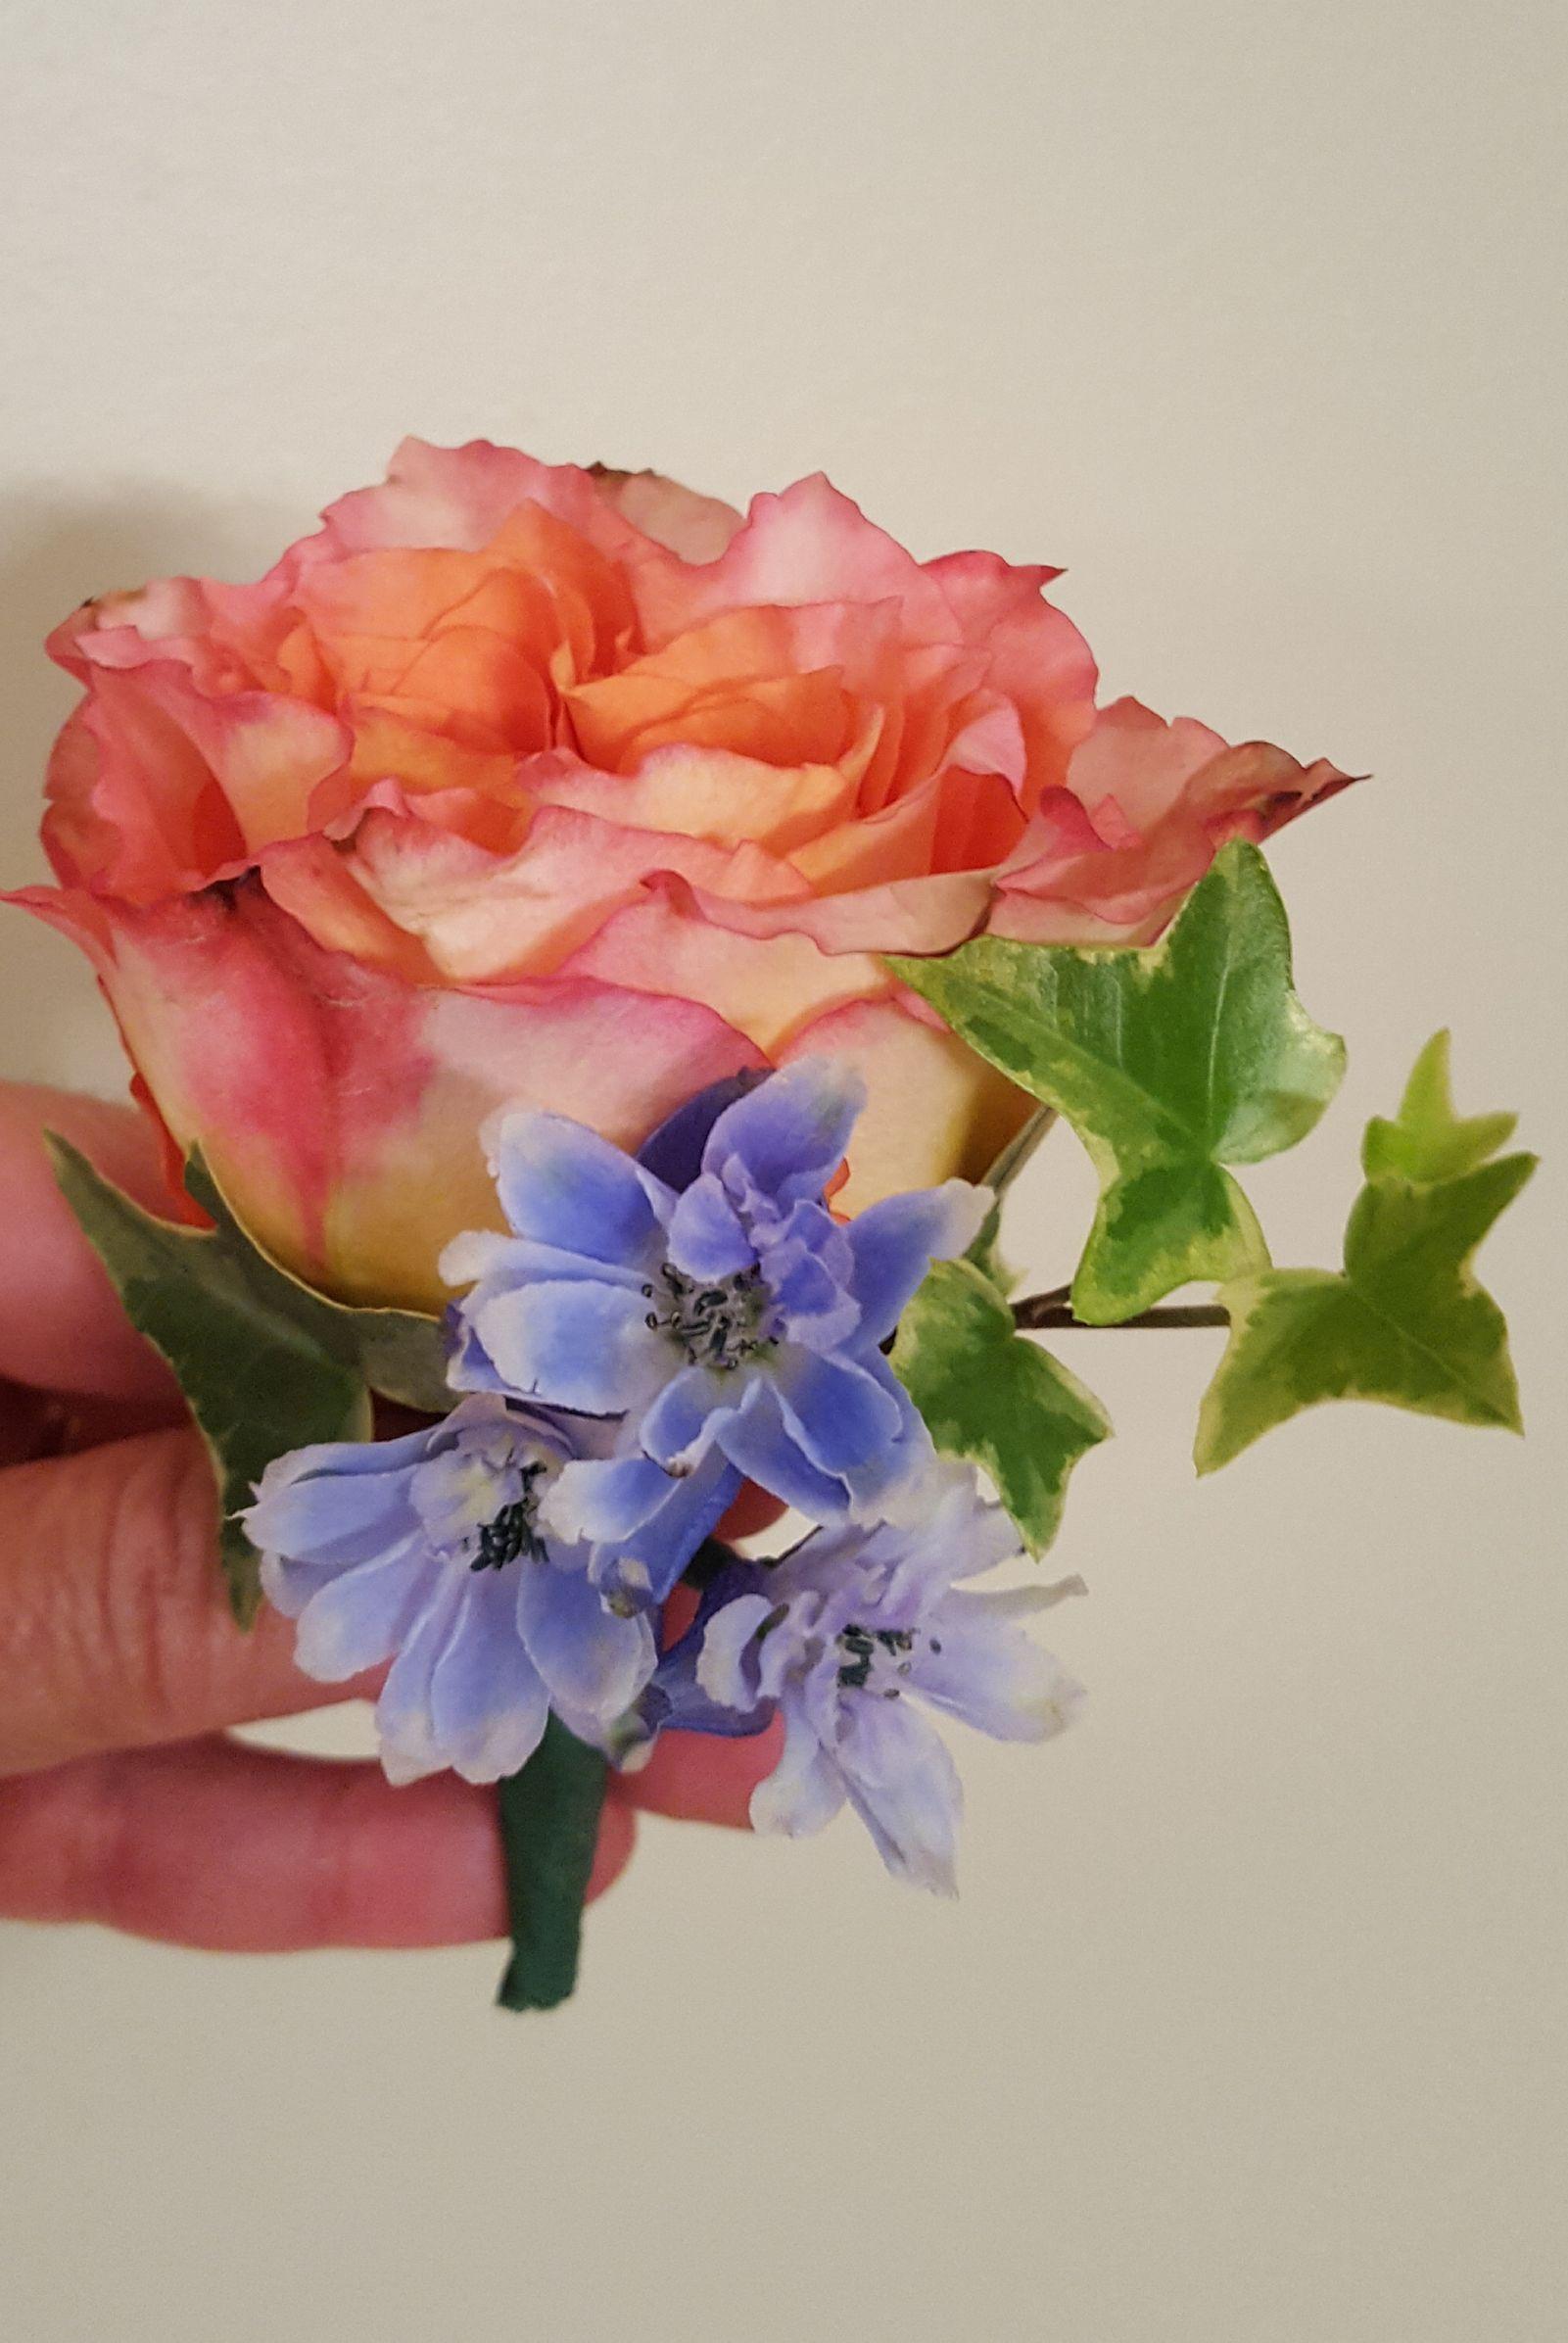 Garden Rose, Ivy and Delphinium